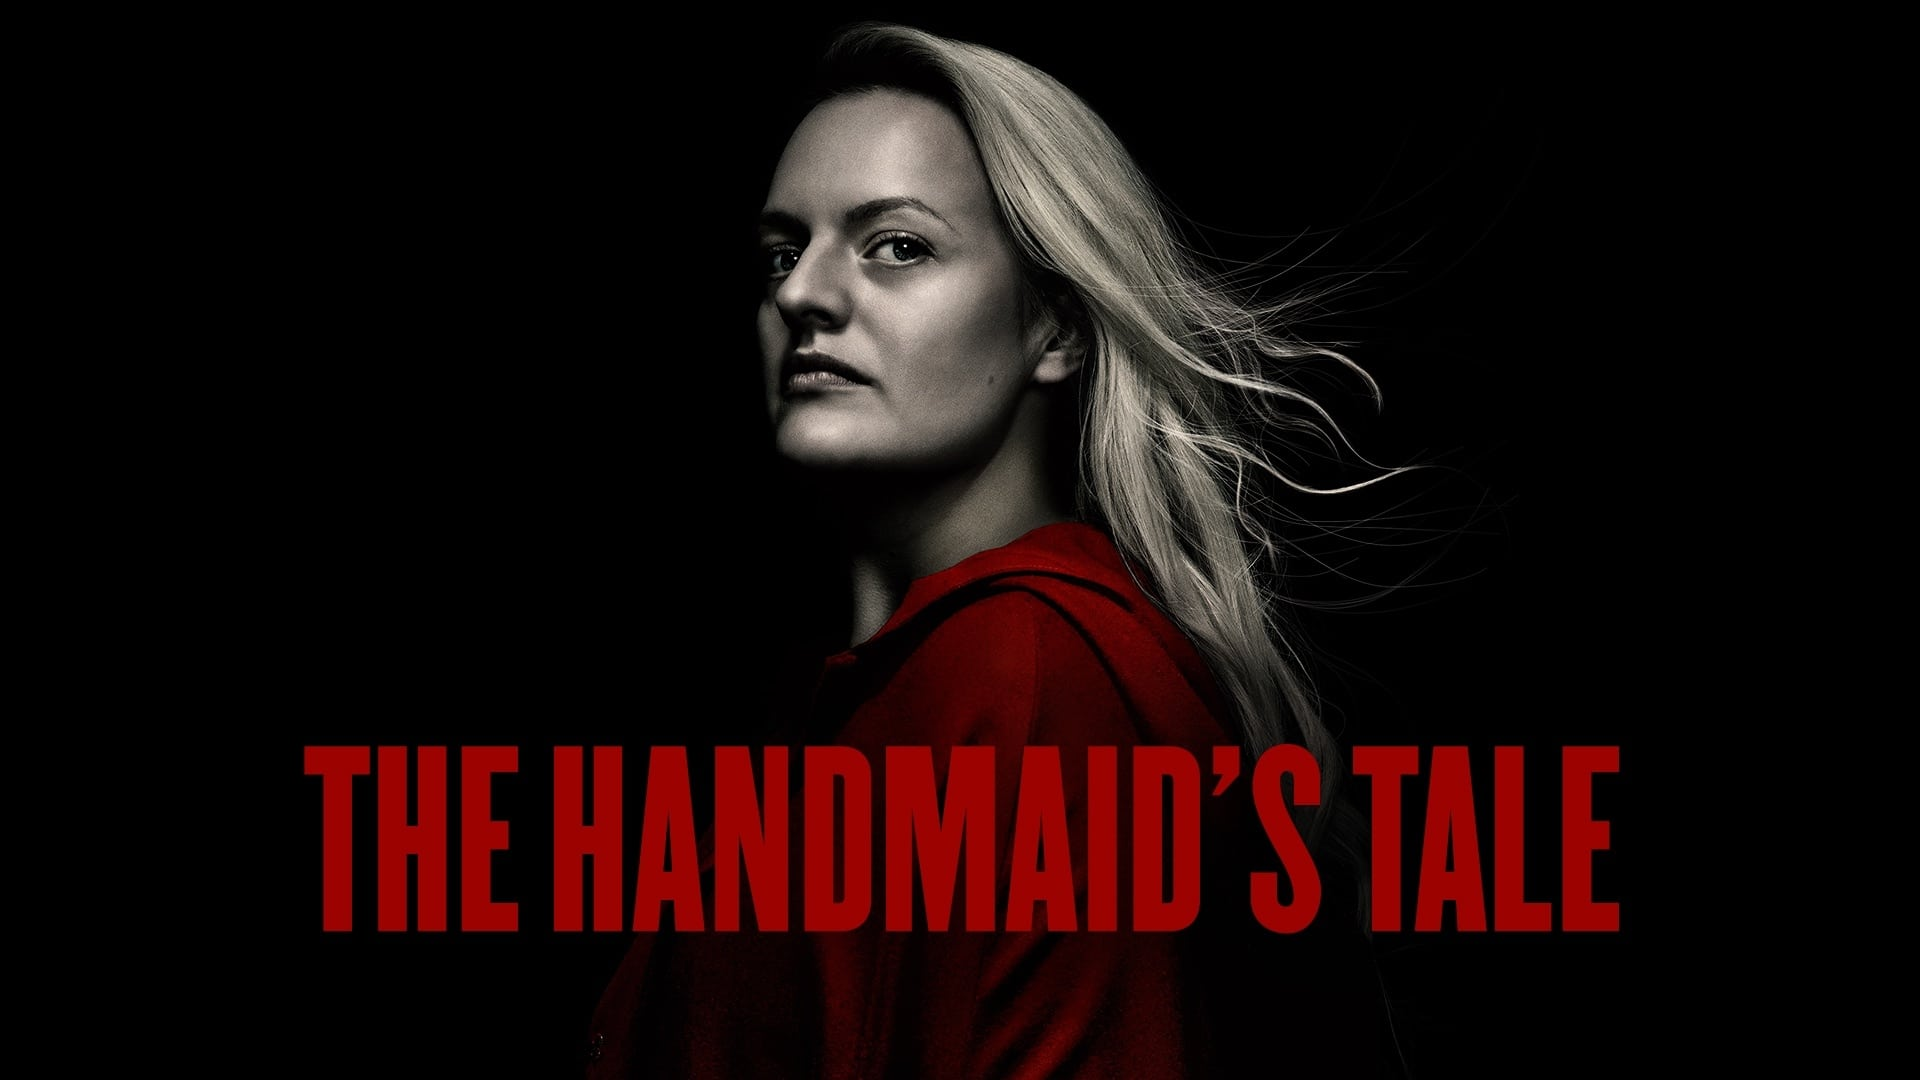 The Handmaid's Tale - Season 3 Episode 5